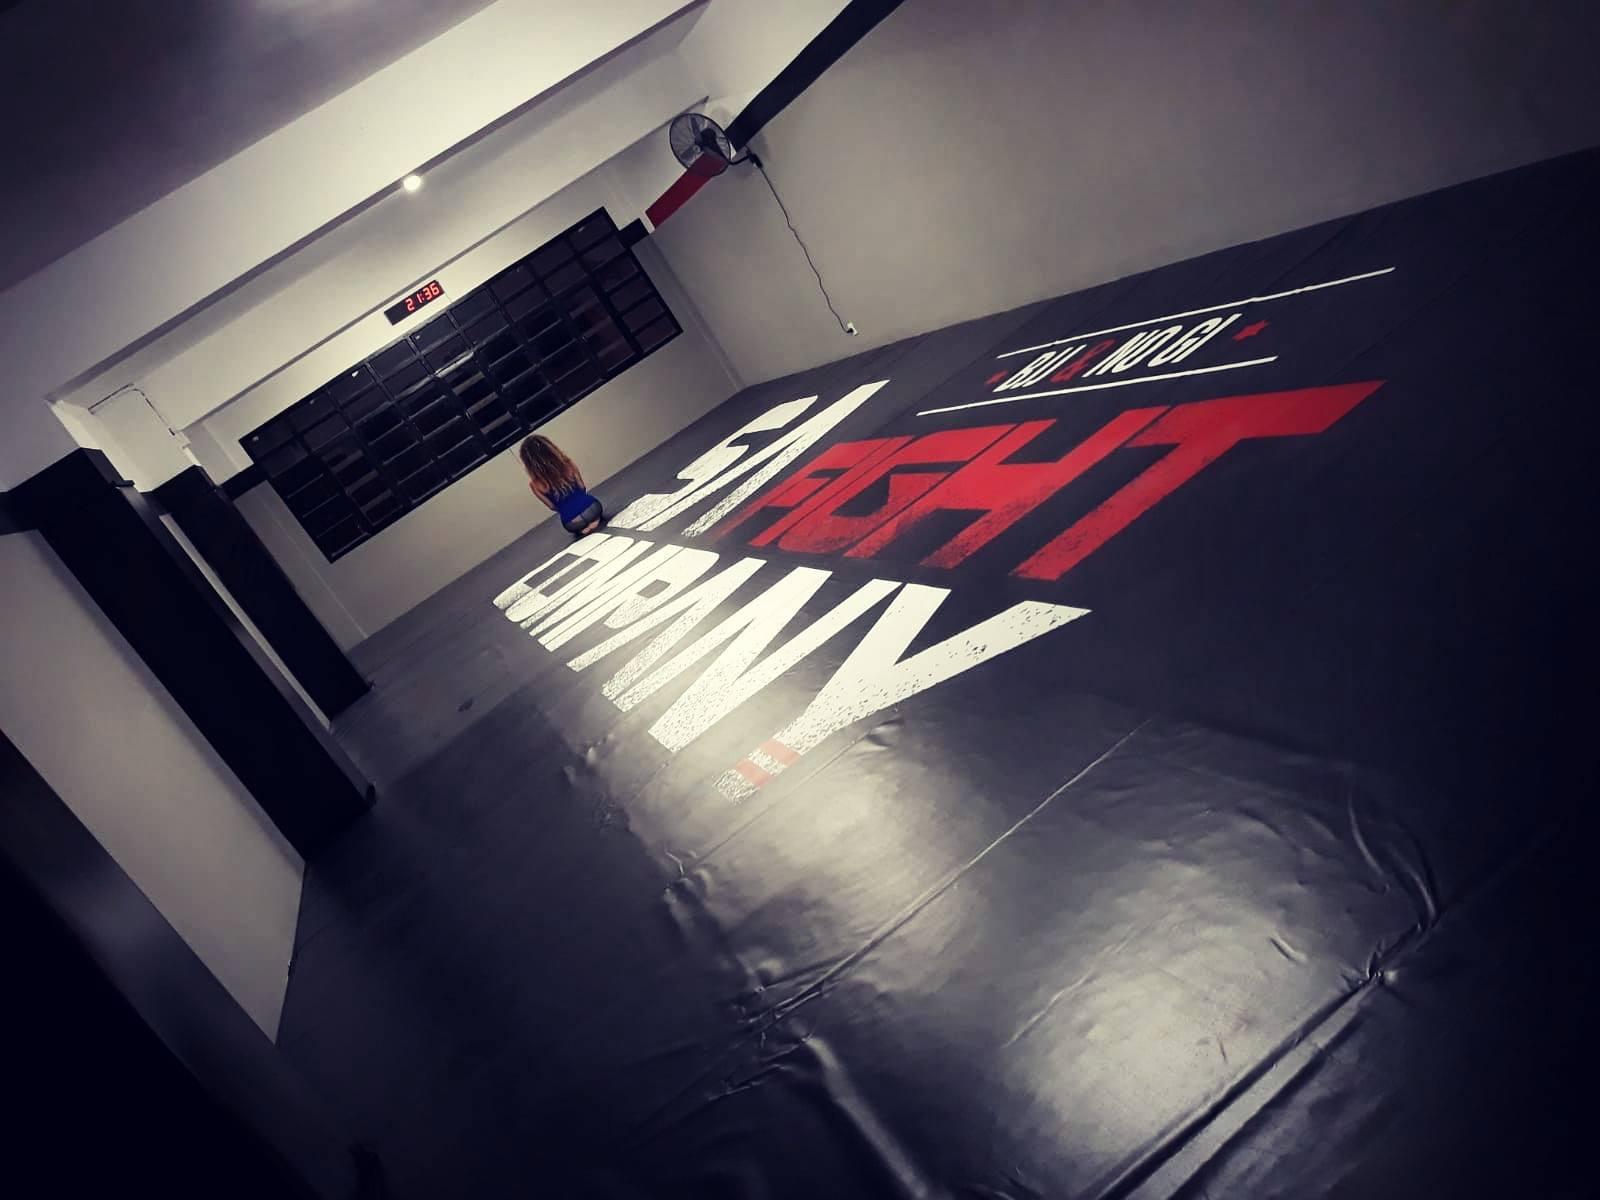 jiu jitsu brasileño, grappling y MMA en deusto